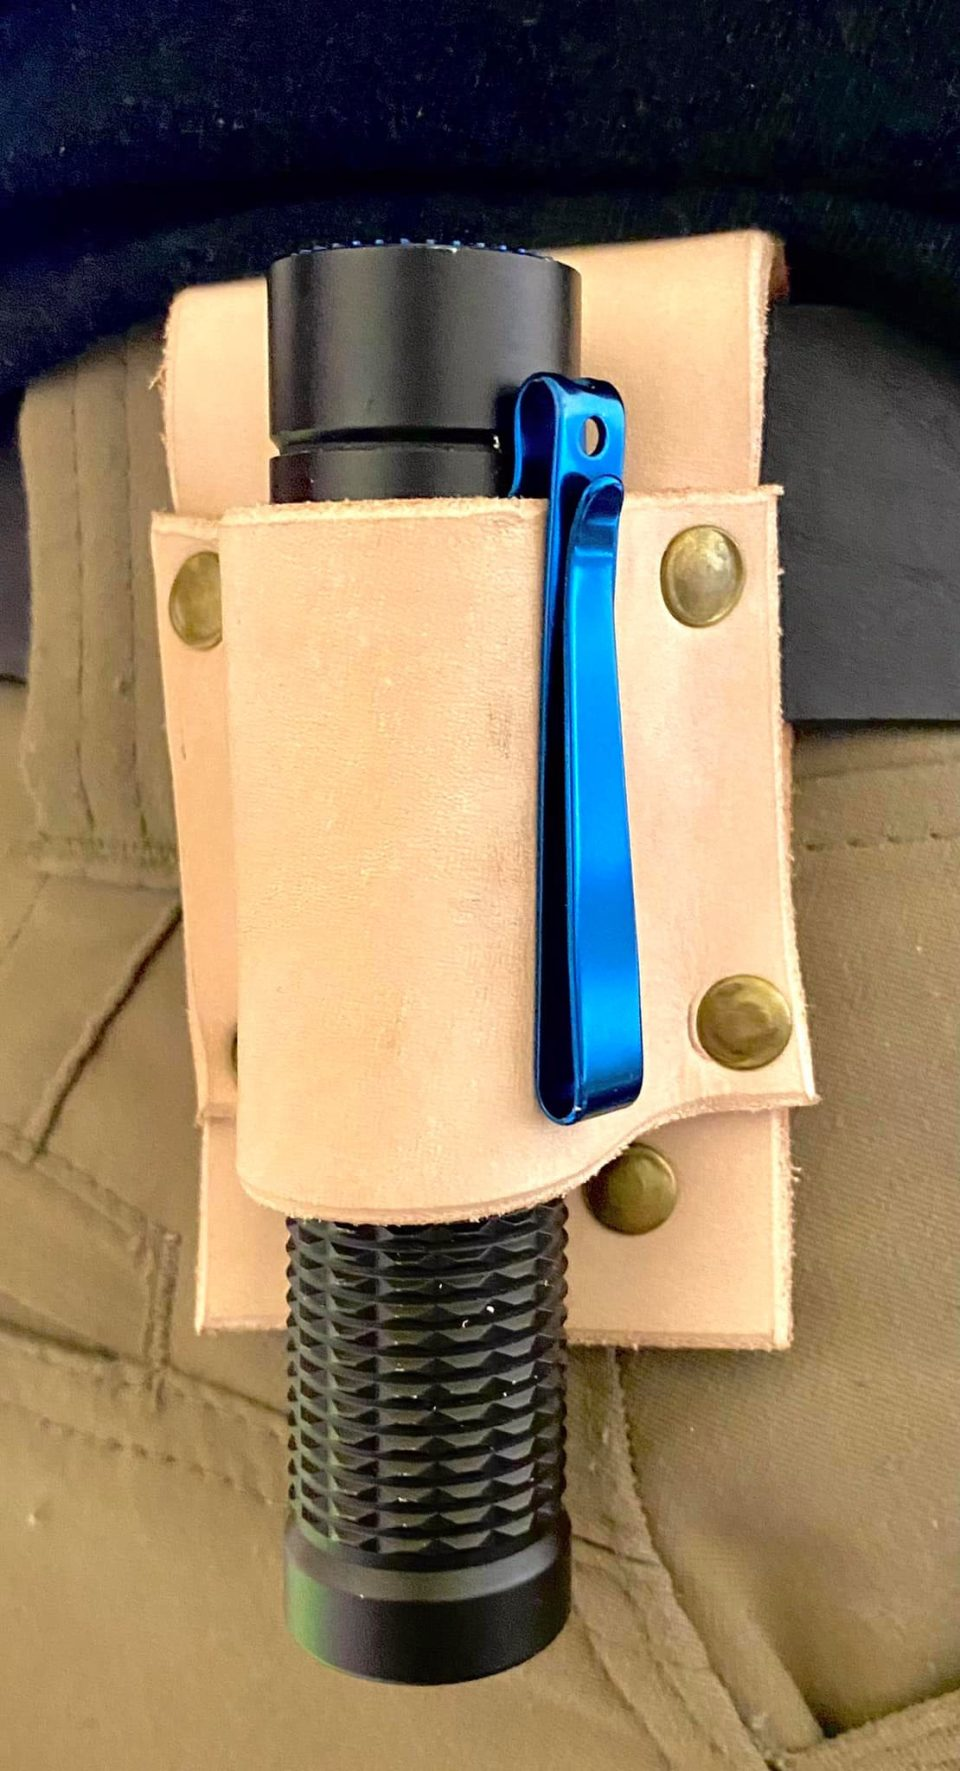 Olight flashlight leather pouch sheathe